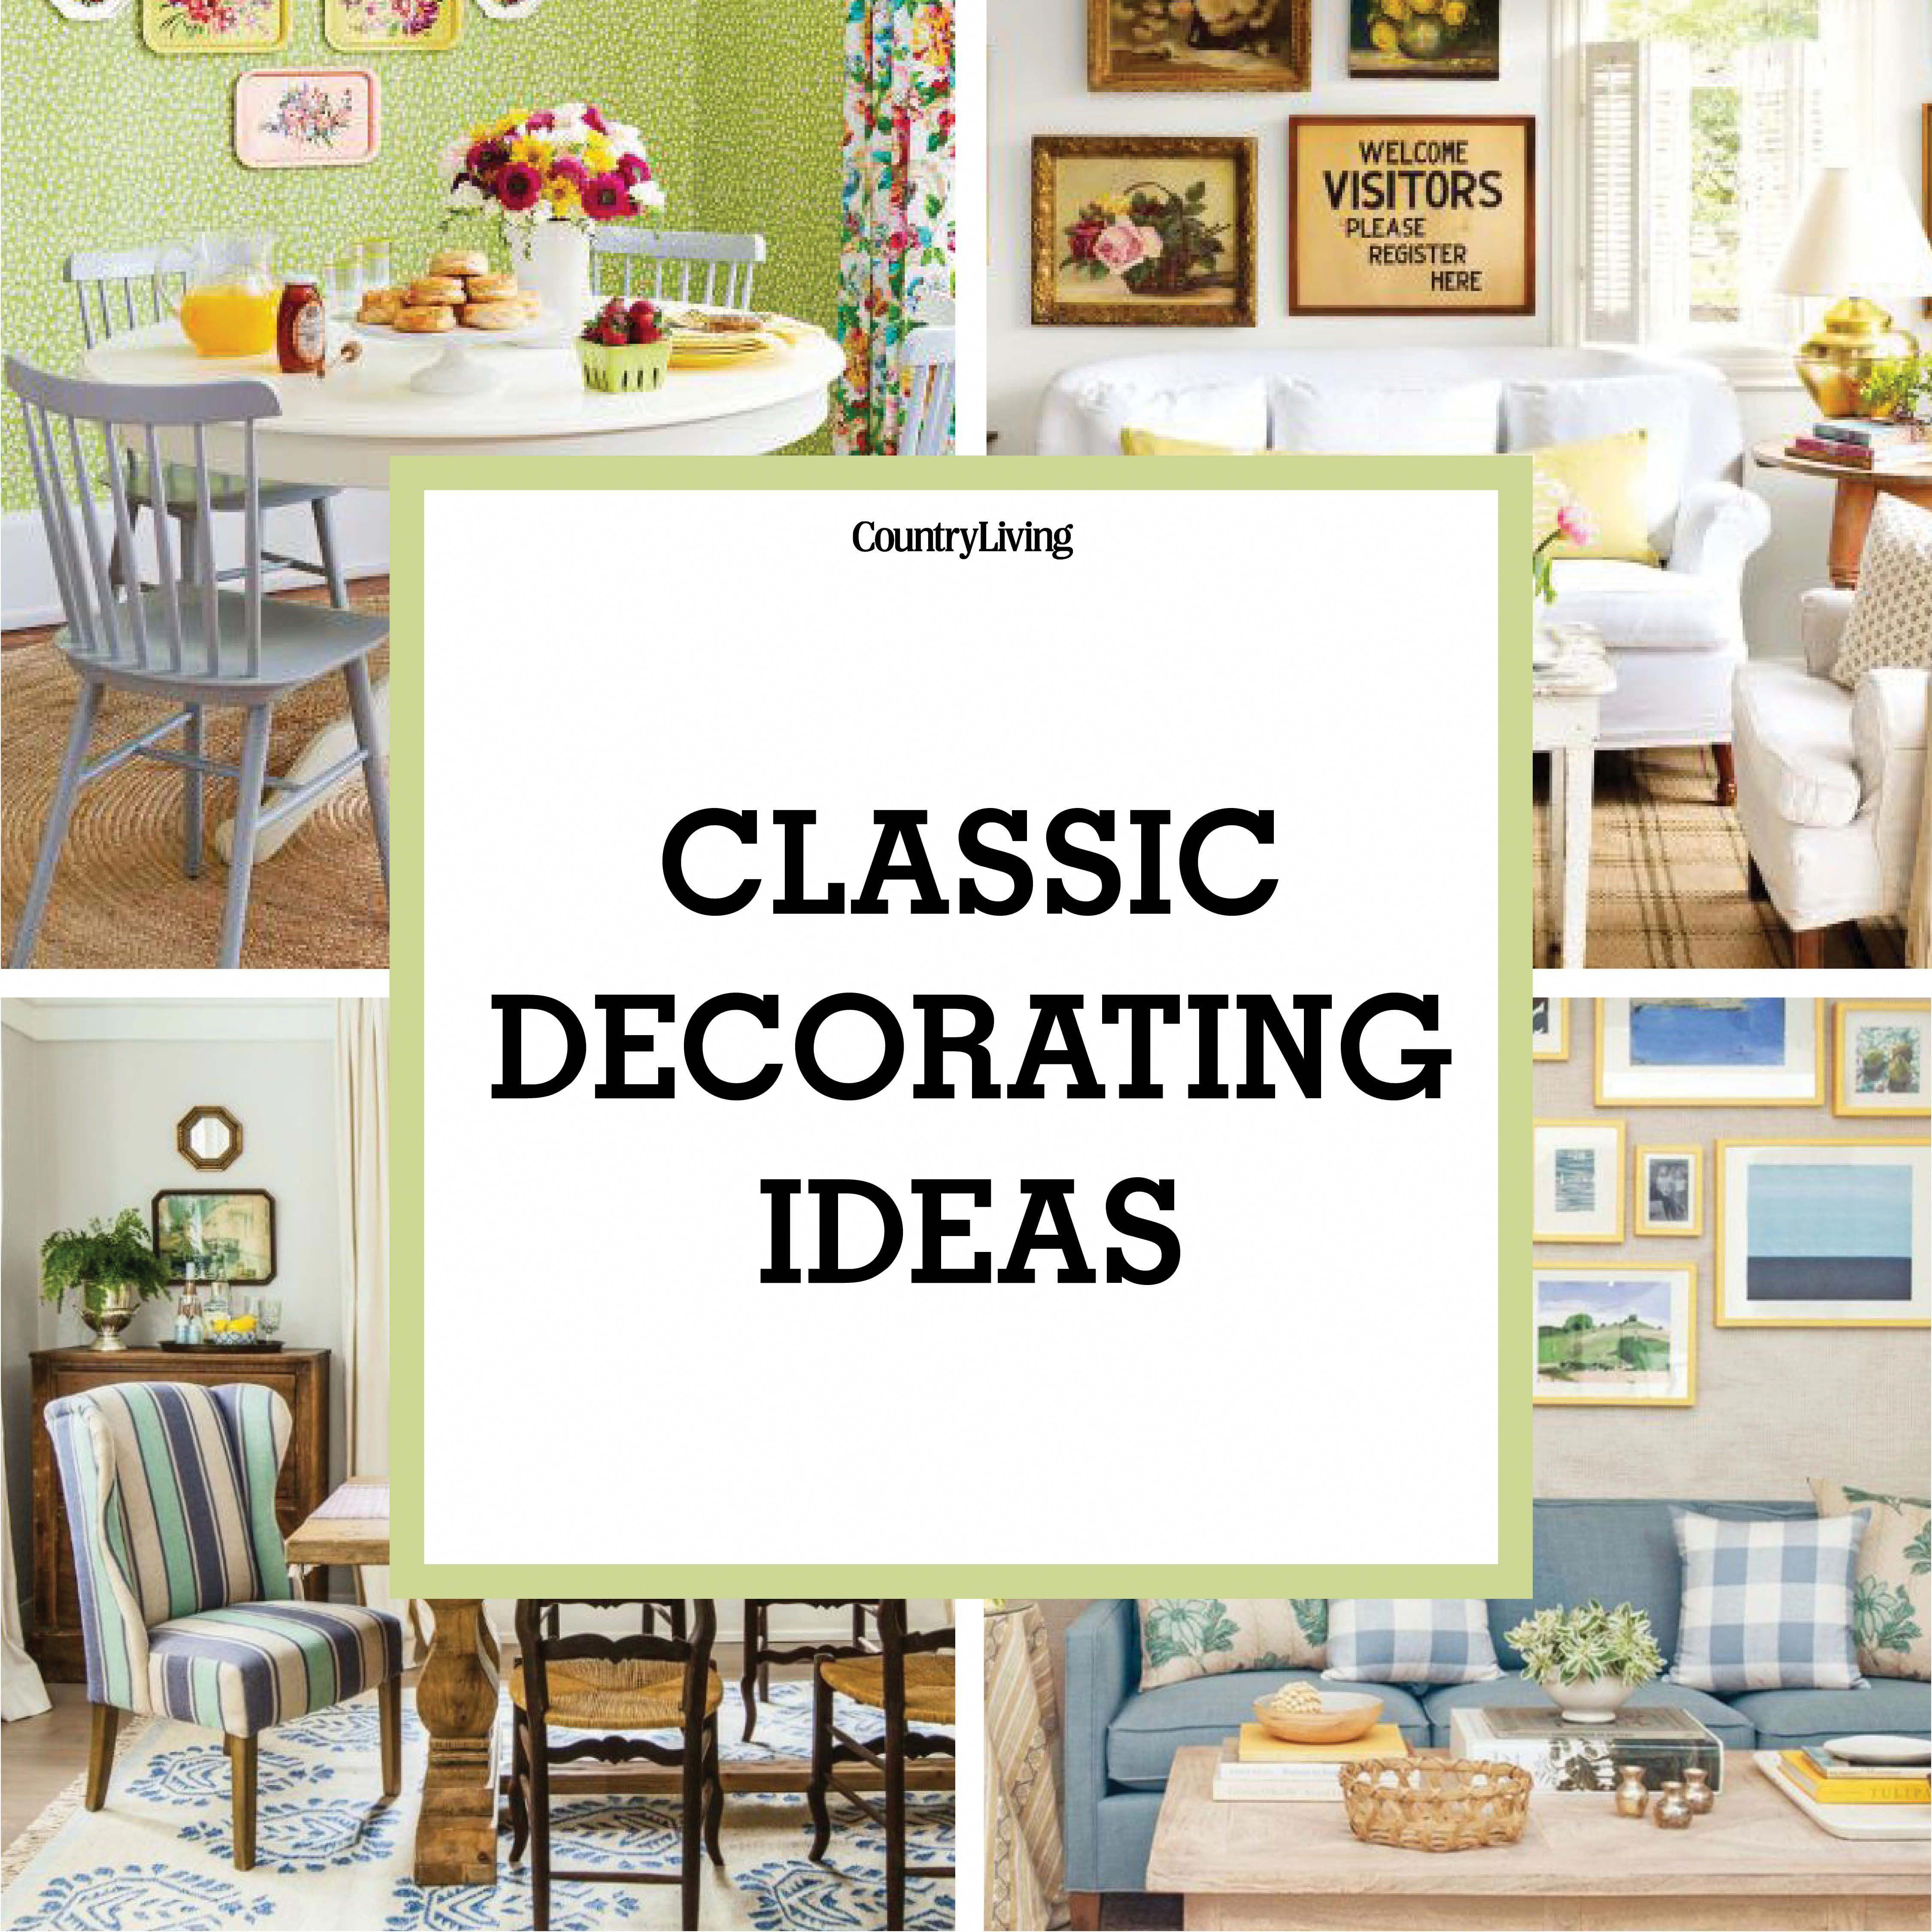 Freshcountrydecorating coastal country cottage decor homes also cool interior designs pinterest rh